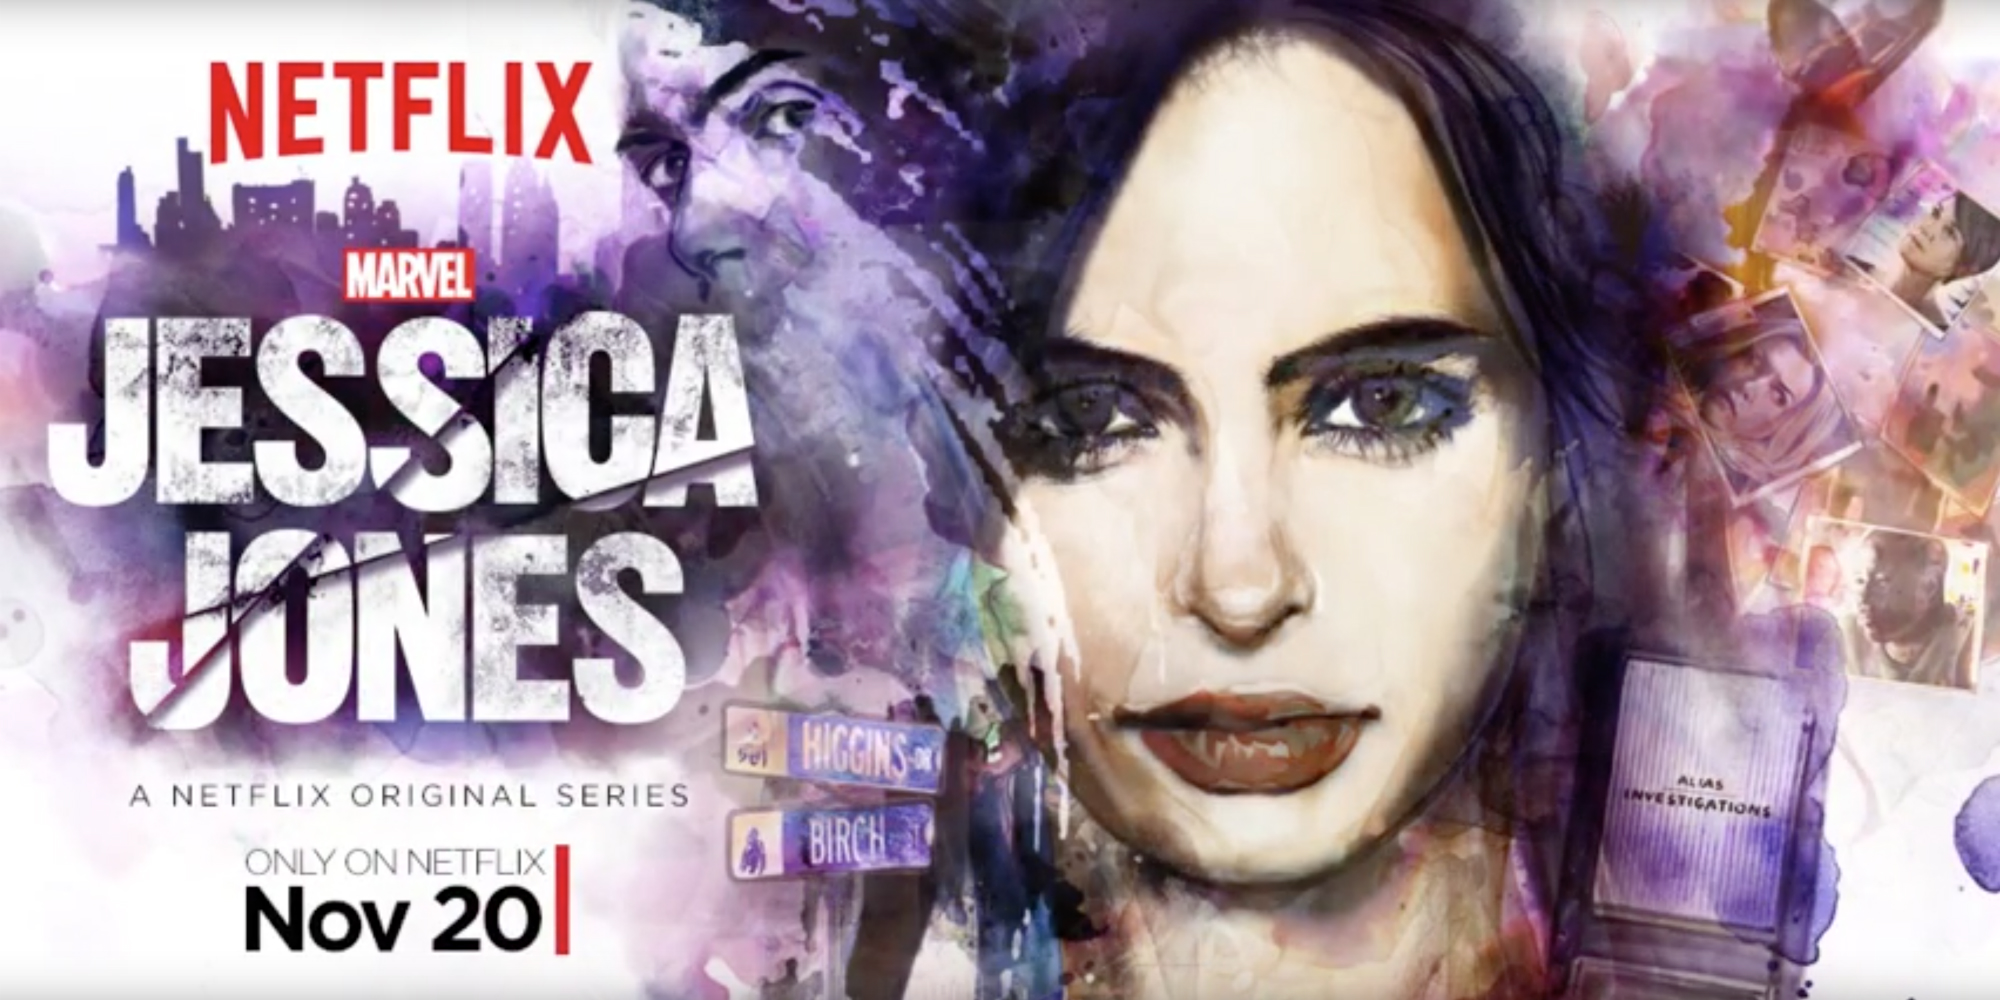 Netflix-vinkkejä